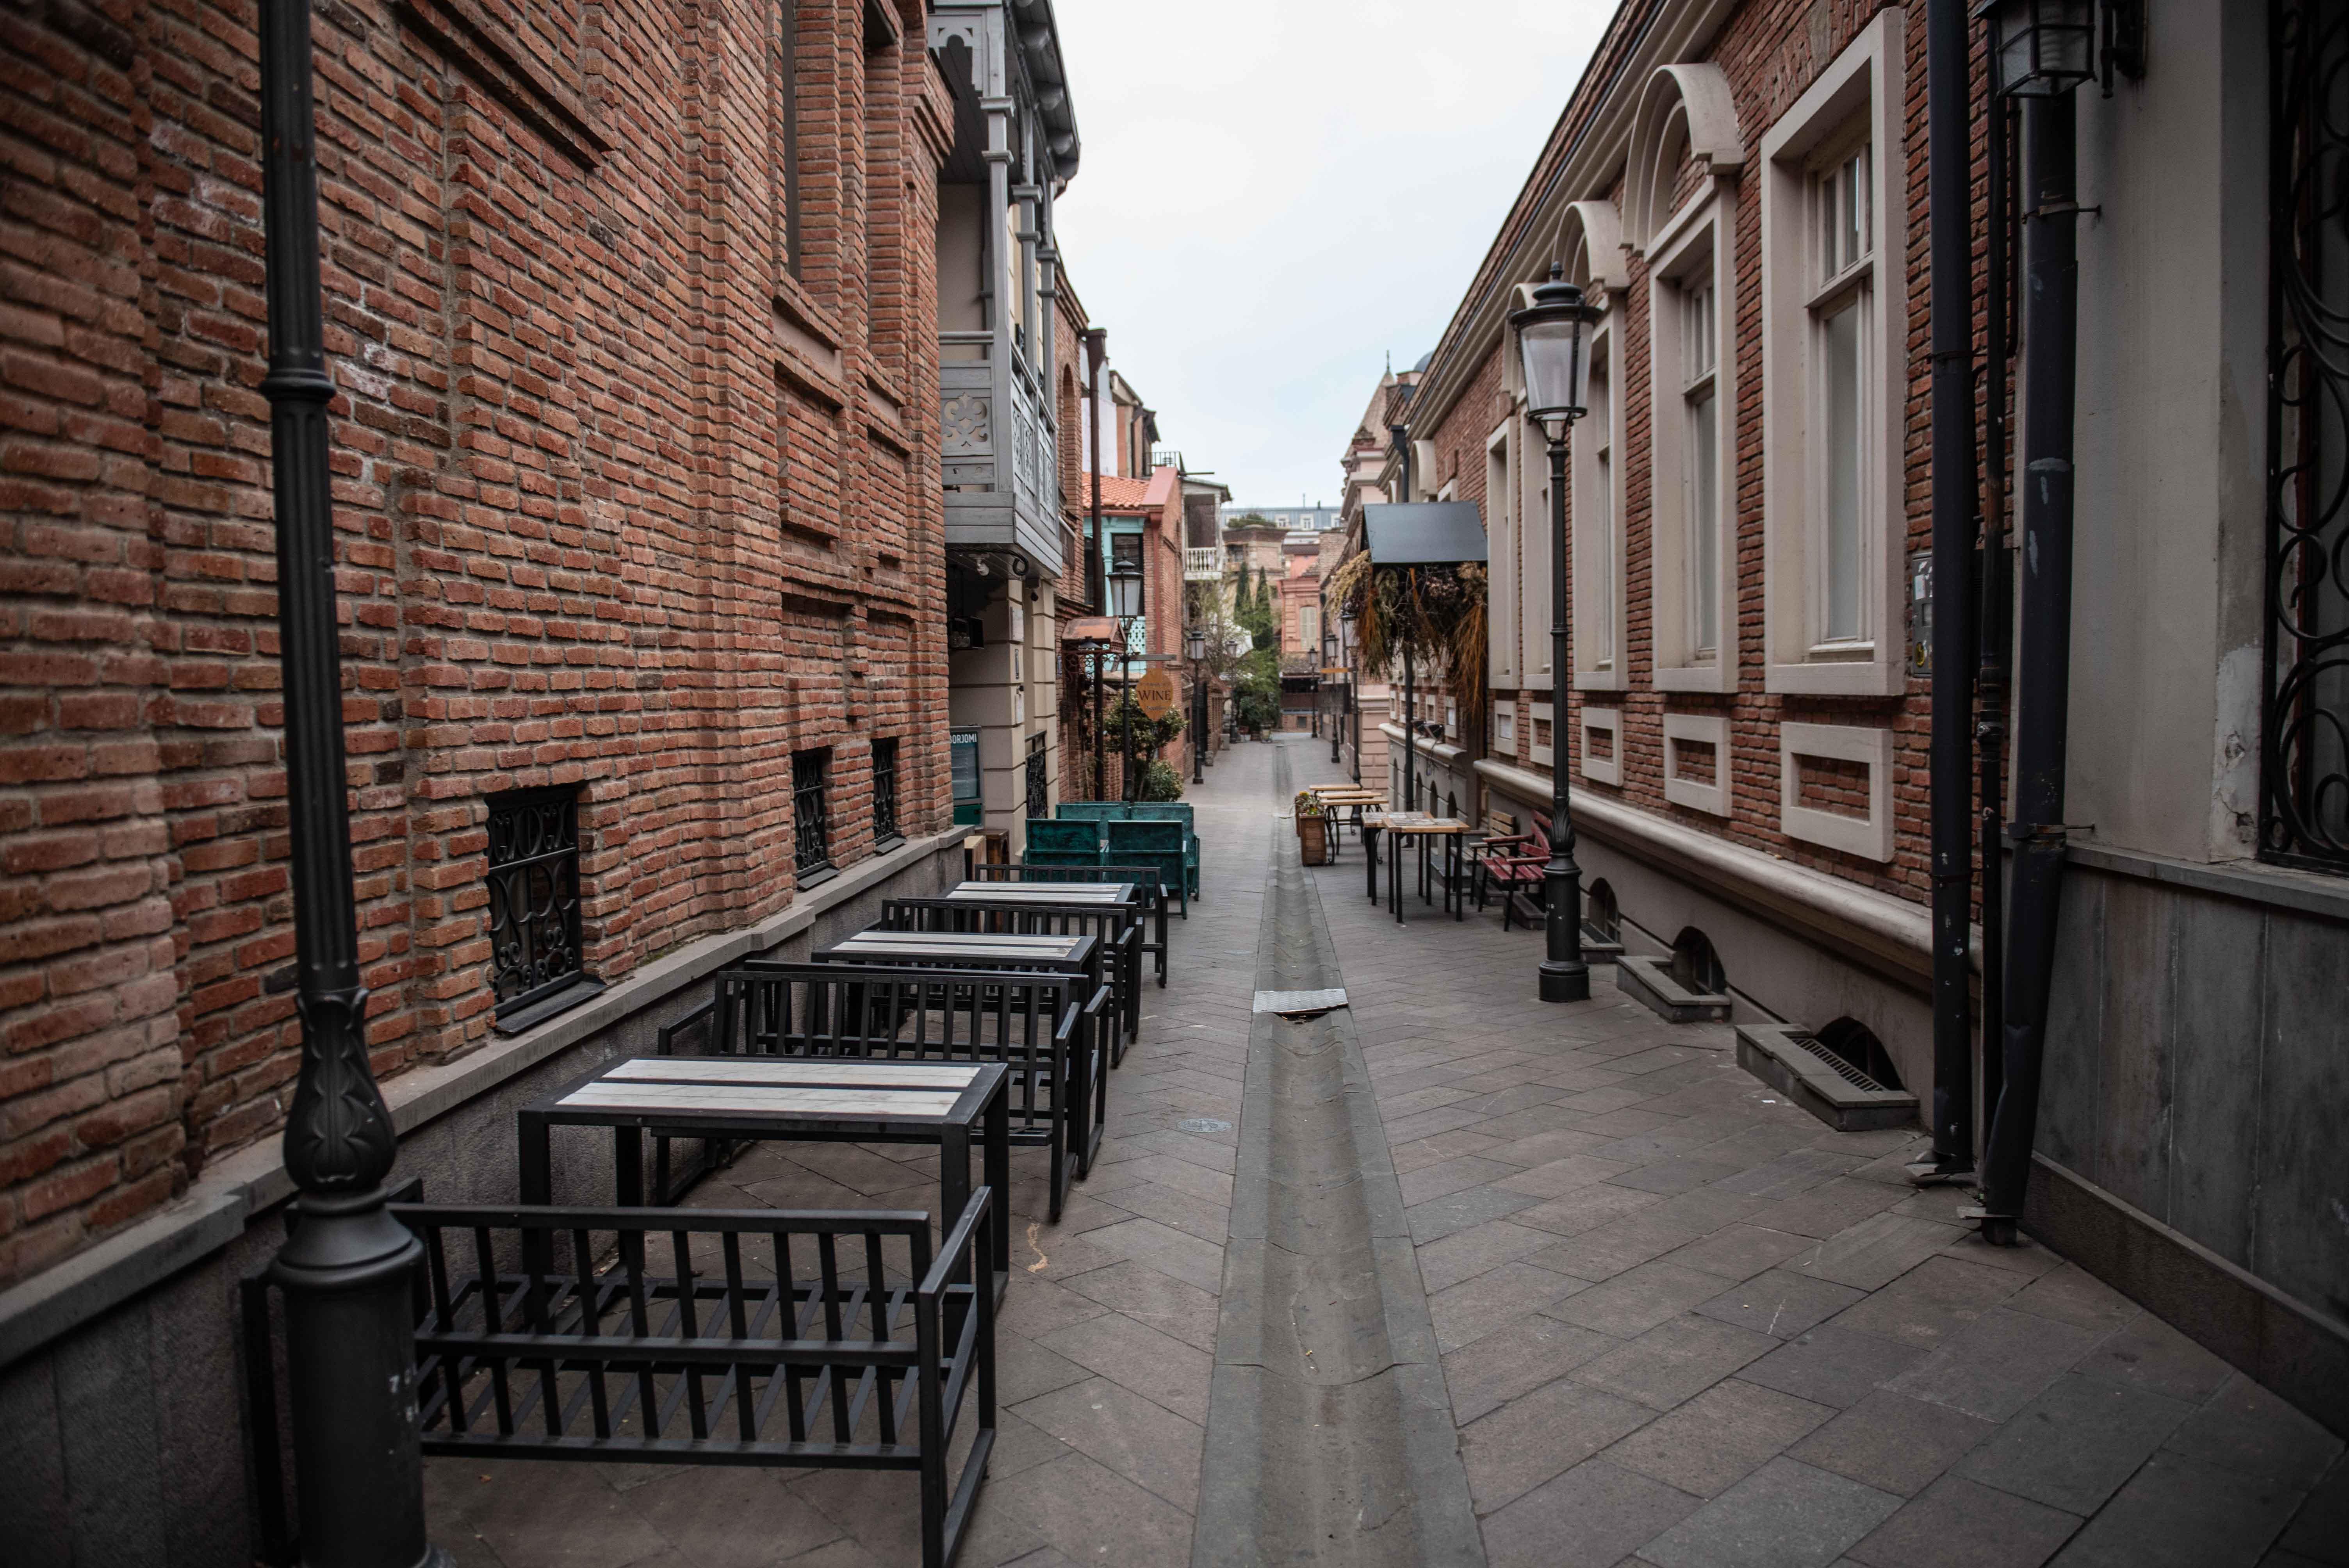 Старый город. Фото: Мариам Никурадзе/OC Media.